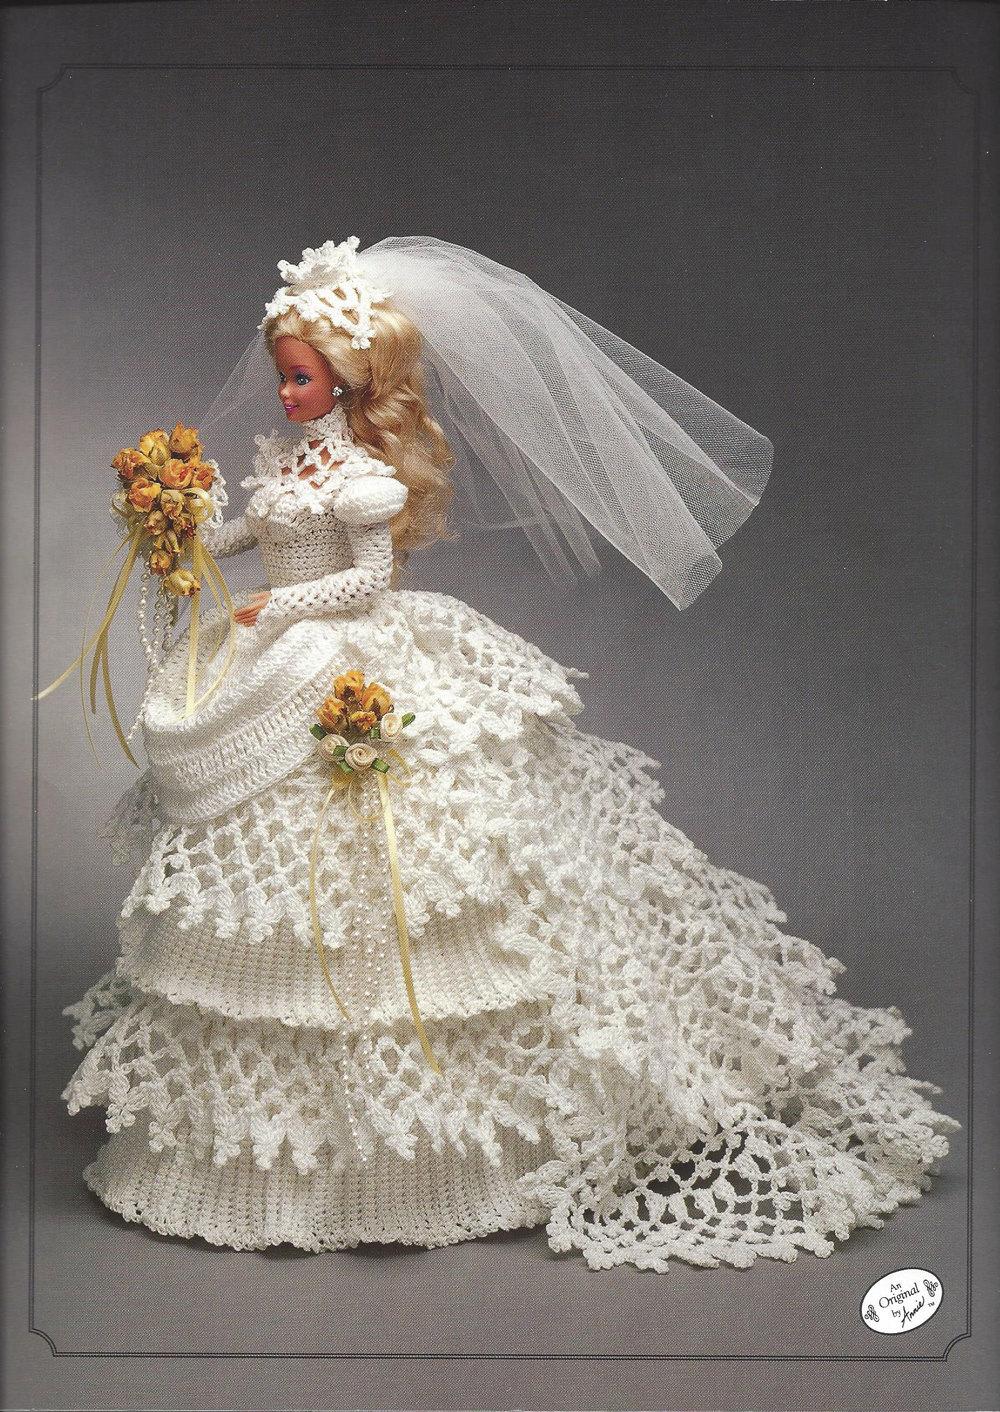 1993 bride doll gown vintage crochet pattern annie 39 s. Black Bedroom Furniture Sets. Home Design Ideas